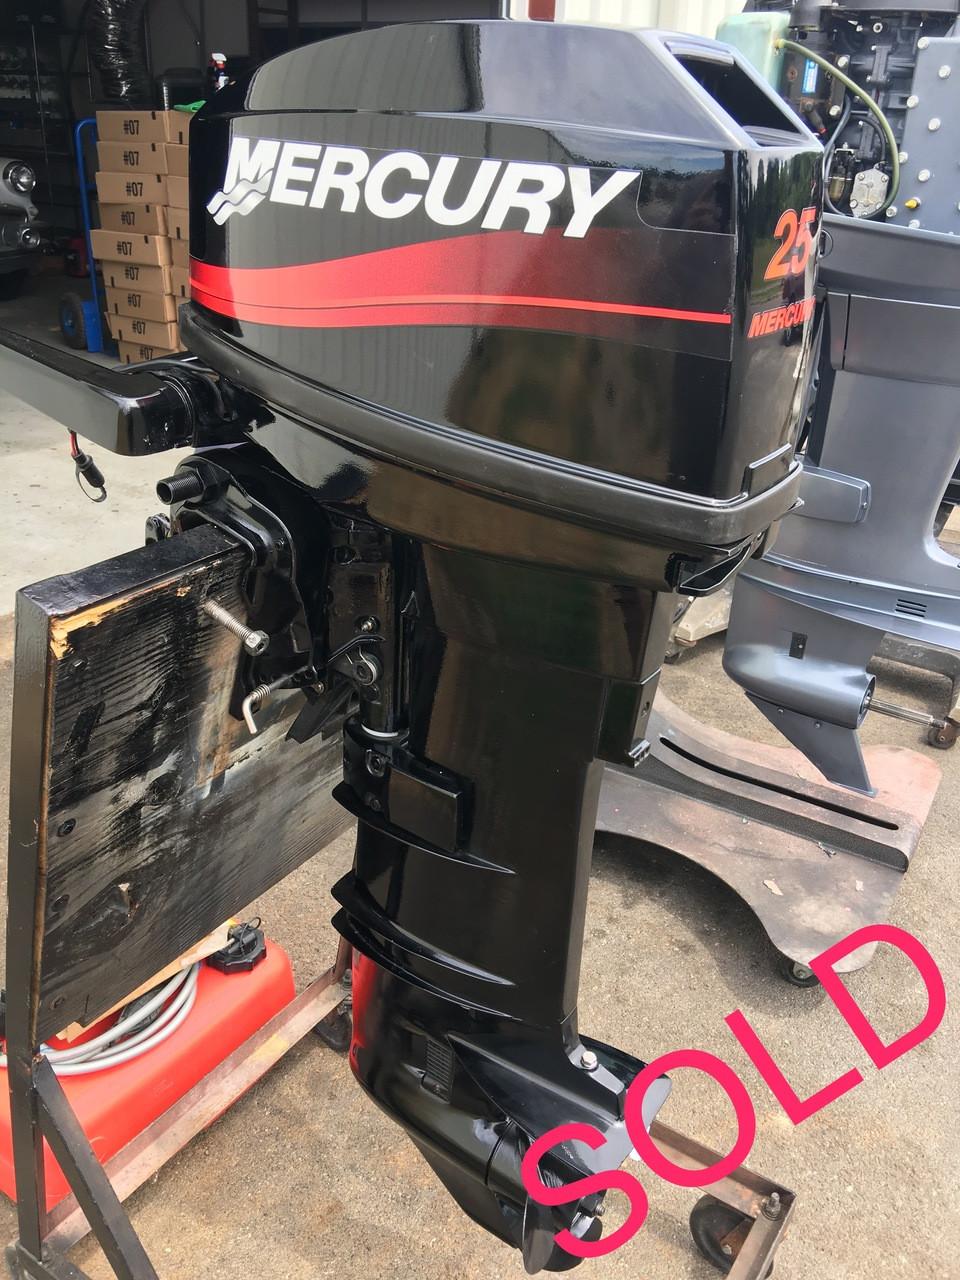 Mercury 25 hp outboard 2 stroke manuals